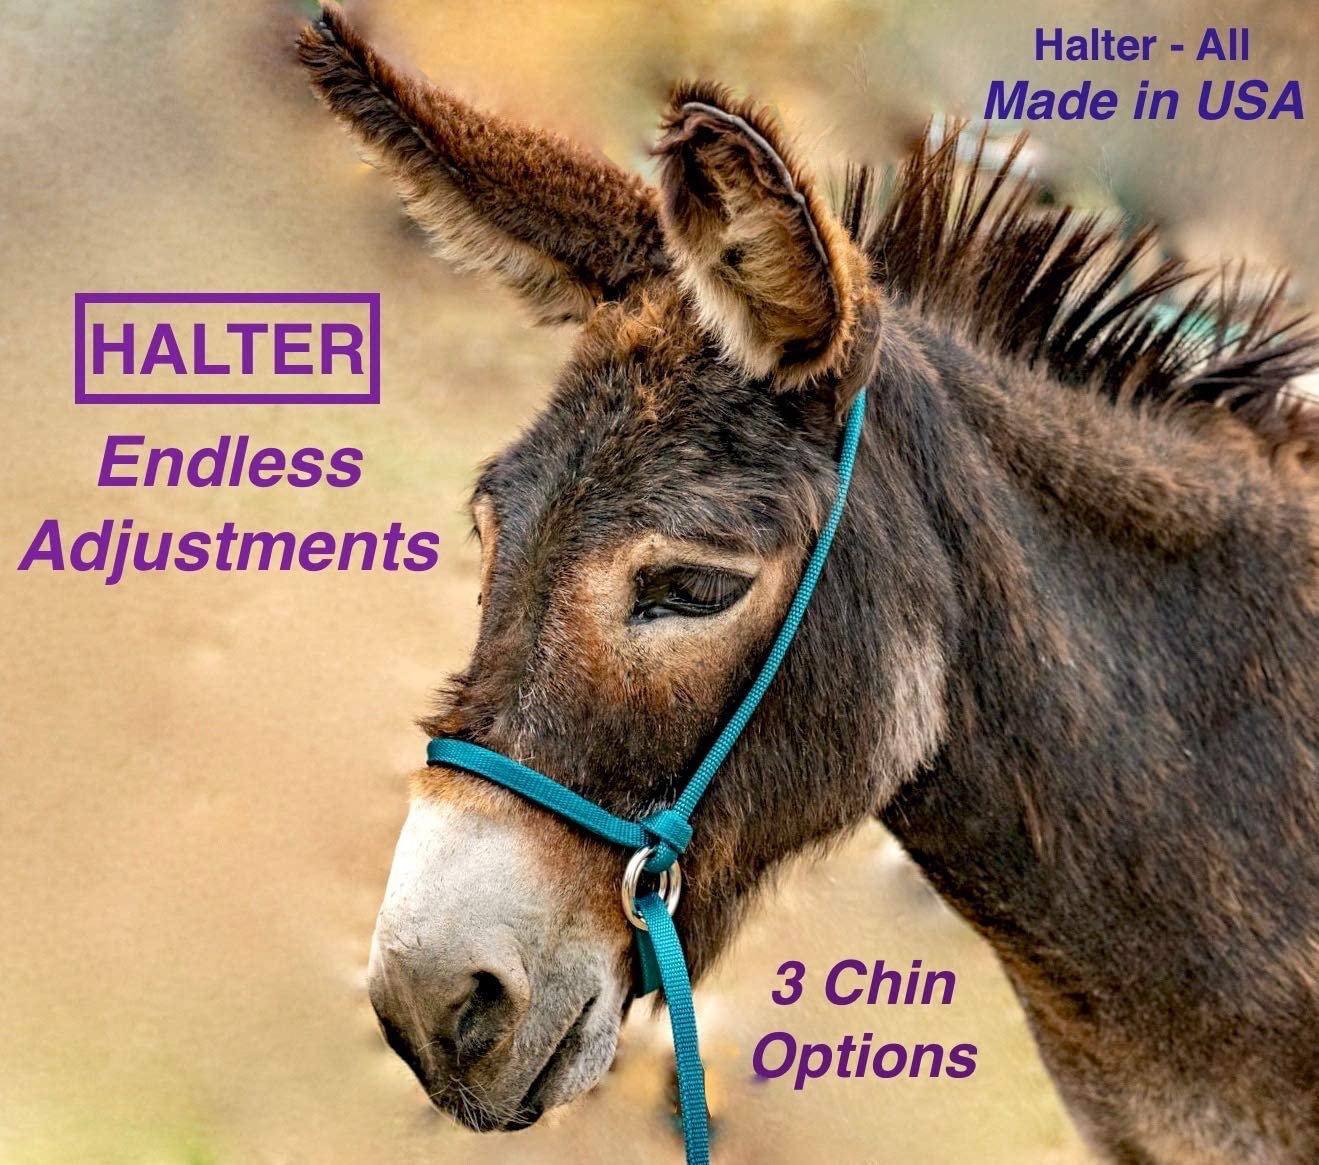 Halter-All Medium Pattern Donkey Small Mule Endless Adjustable Halter & Lead USA